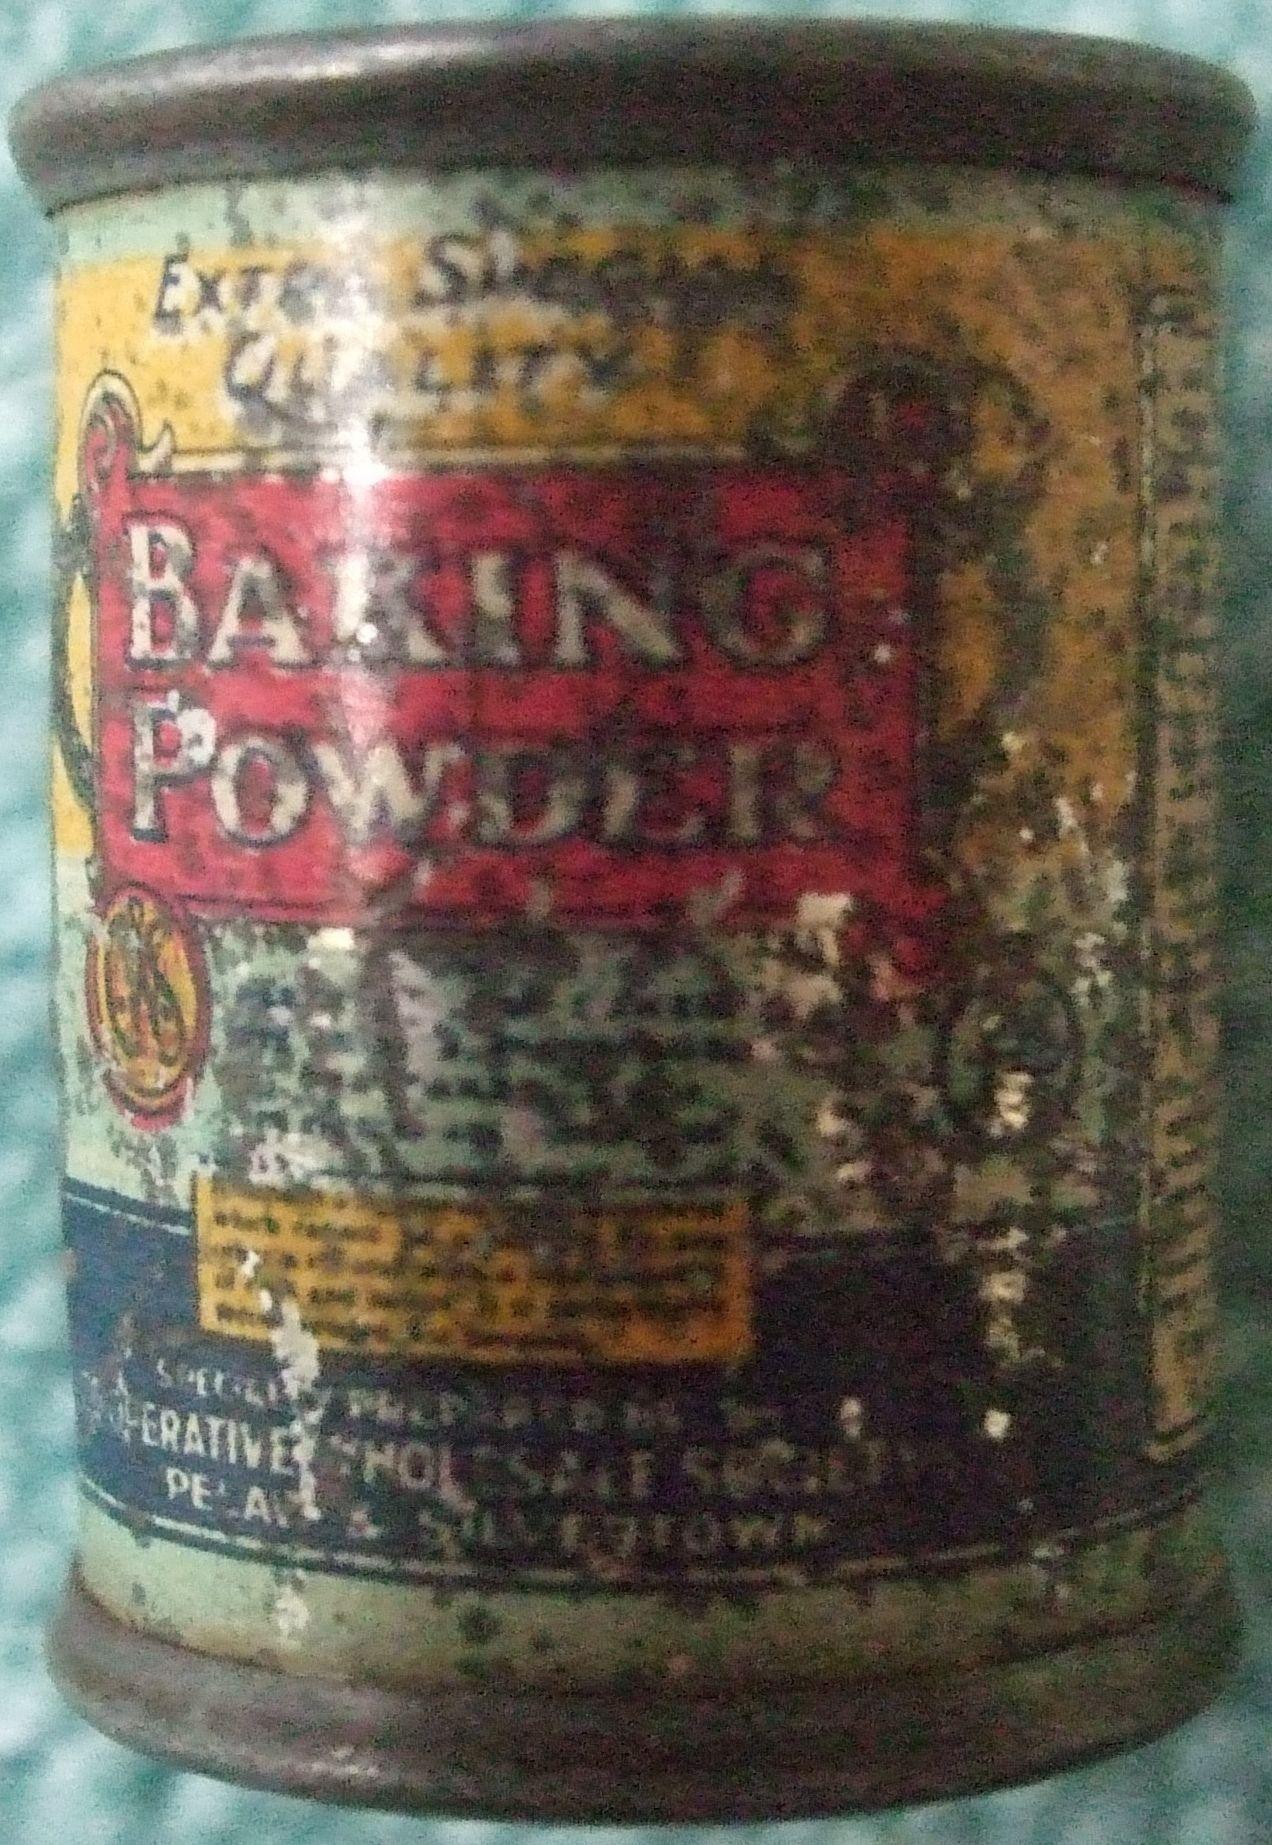 CWS Baking Powder pencil sharpener Poor condition sorry CWS